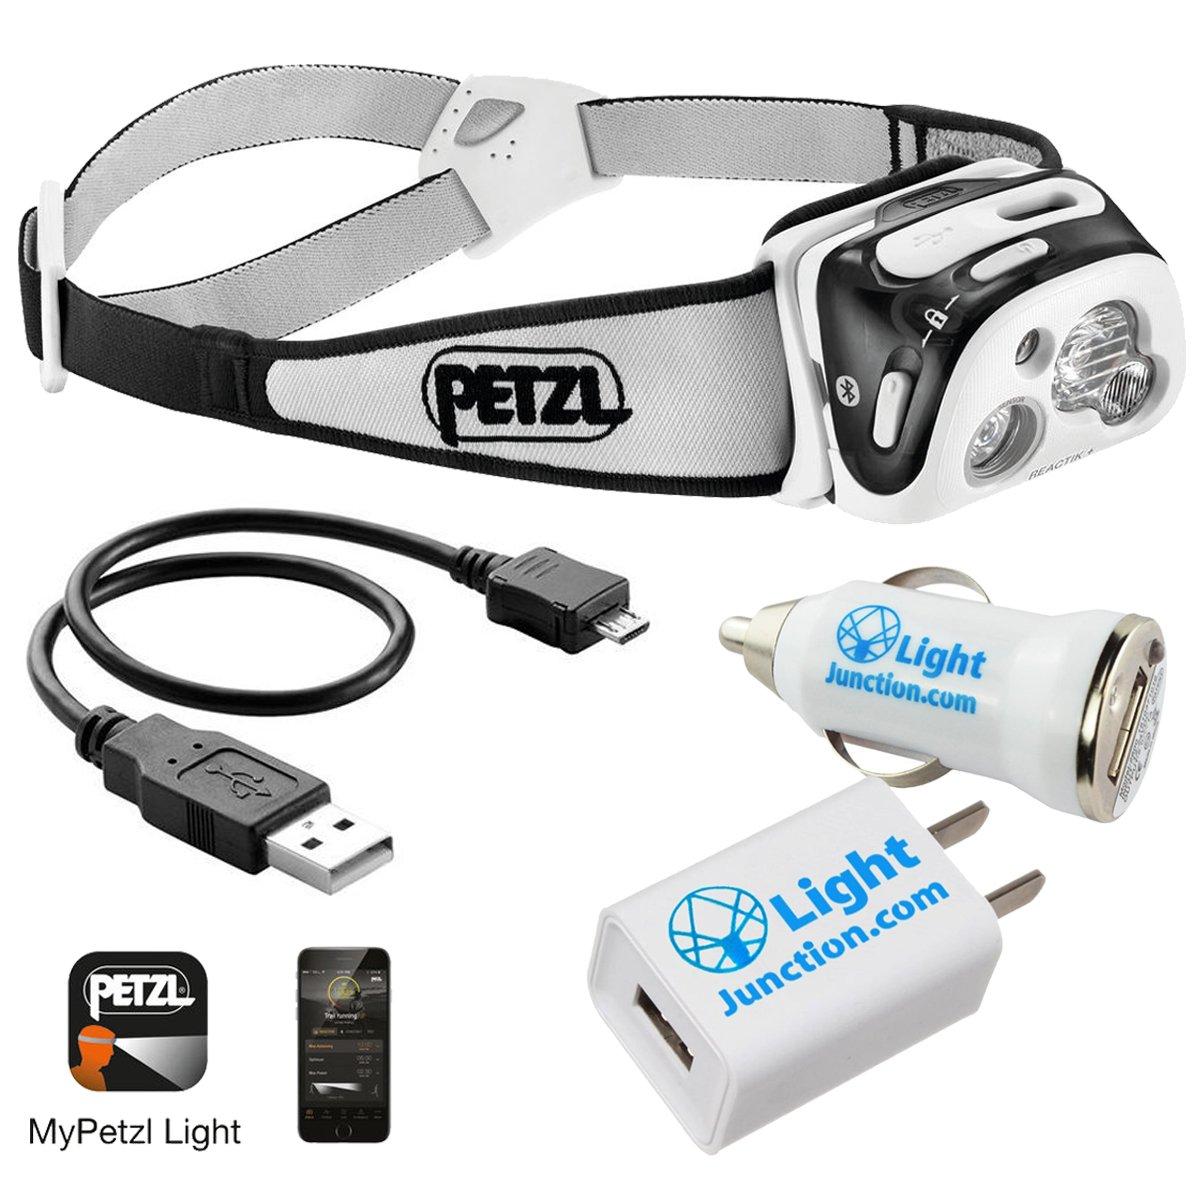 Petzl - REACTIK+ Headlamp (E95 HNE) 300 Lumens, Bluetooth Enabled - Includes 1 Lightjunction USB Car Adapter and 1 Lightjunction USB Wall Adapter